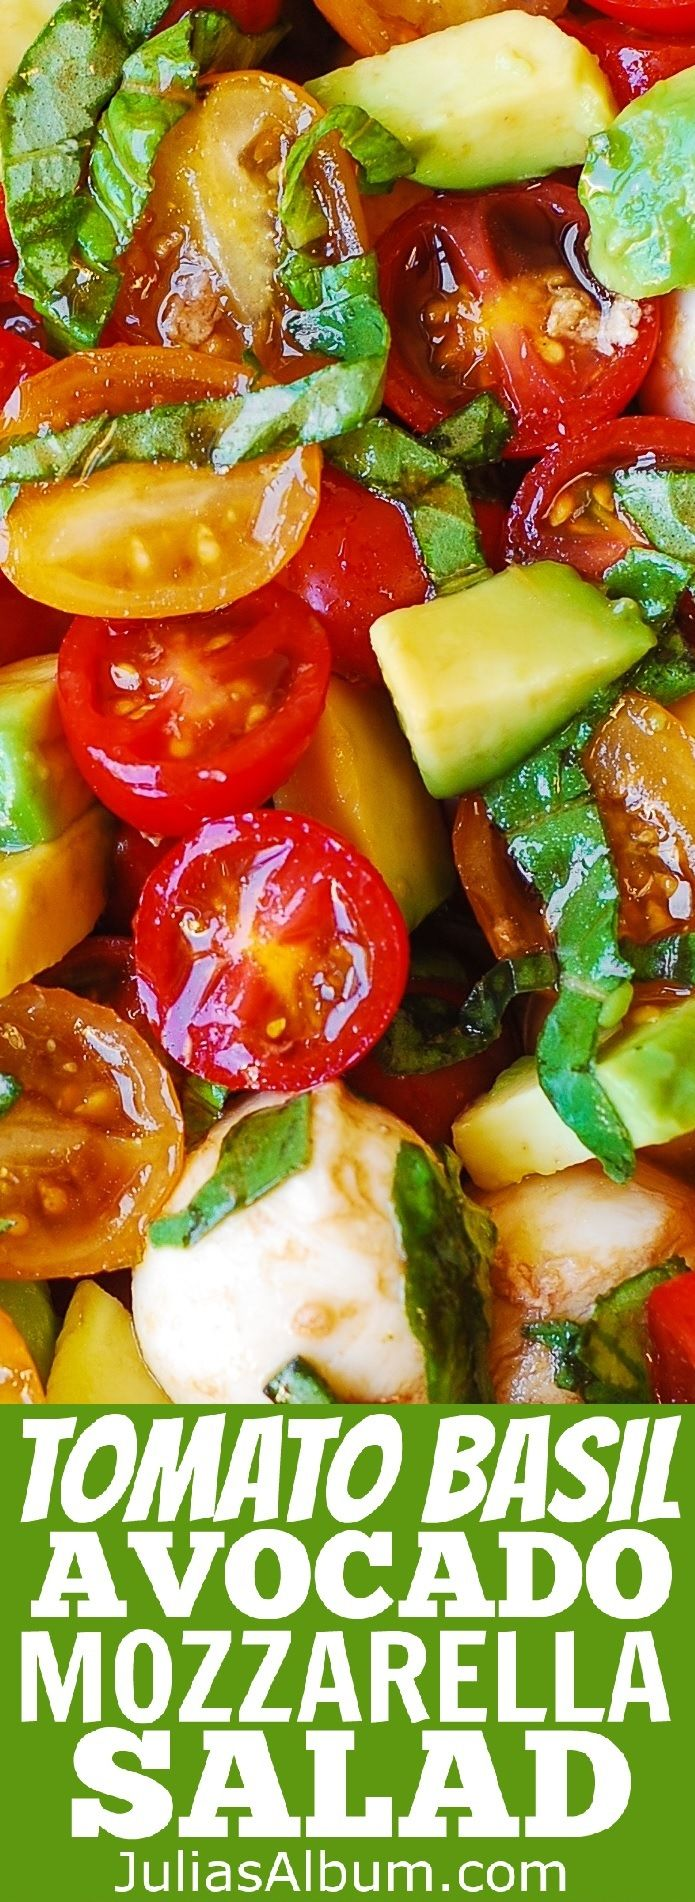 Tomato Basil Avocado Mozzarella Salad with Balsamic Dressing - #healthy #glutenfree #gf